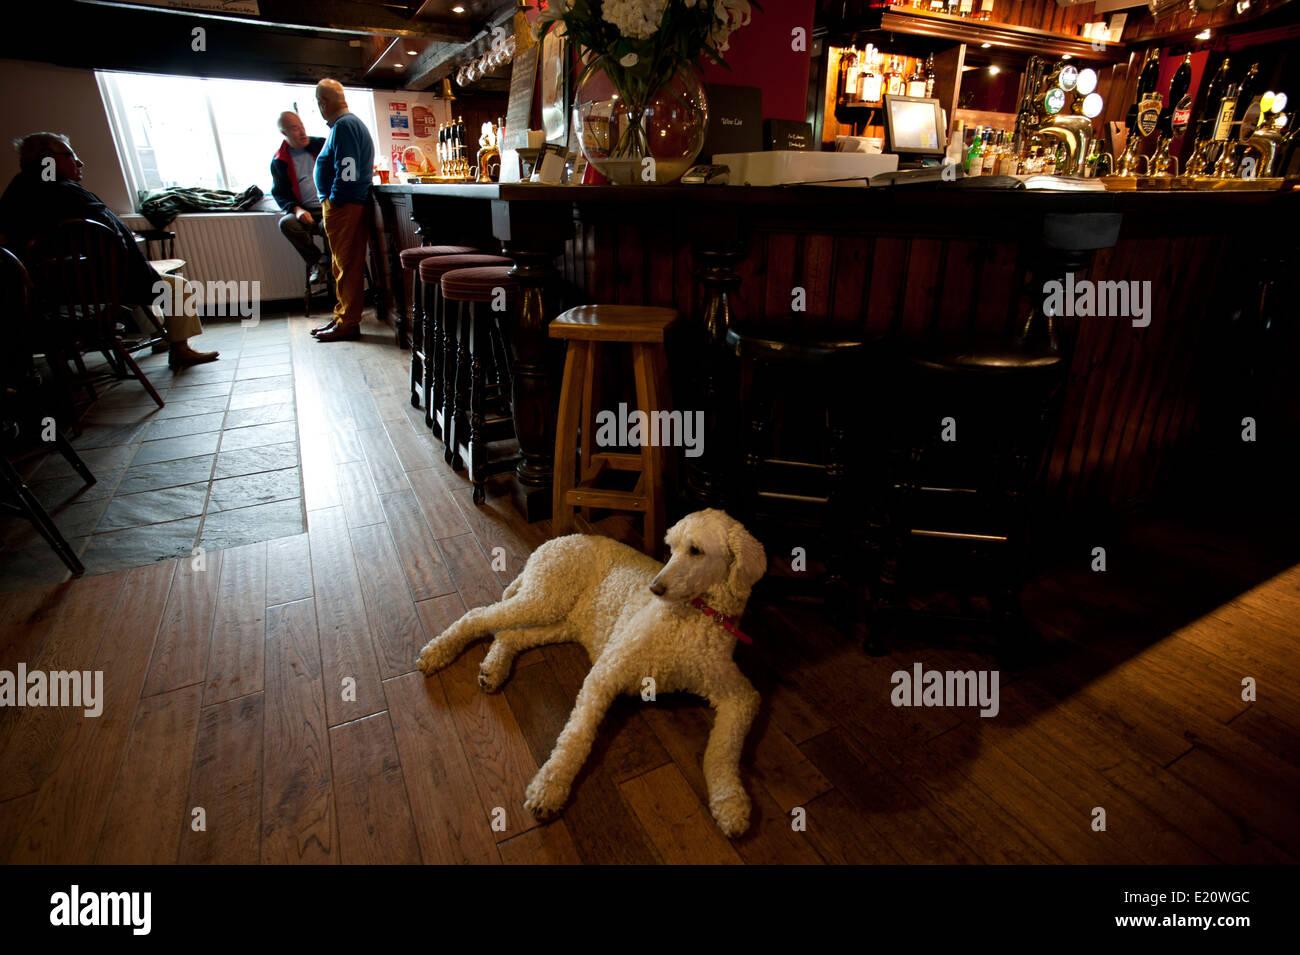 Devonshire Arms Pub, Cracoe, Yorkshire Dales National Park, Yorkshire, England,UK. June 2014 - Stock Image